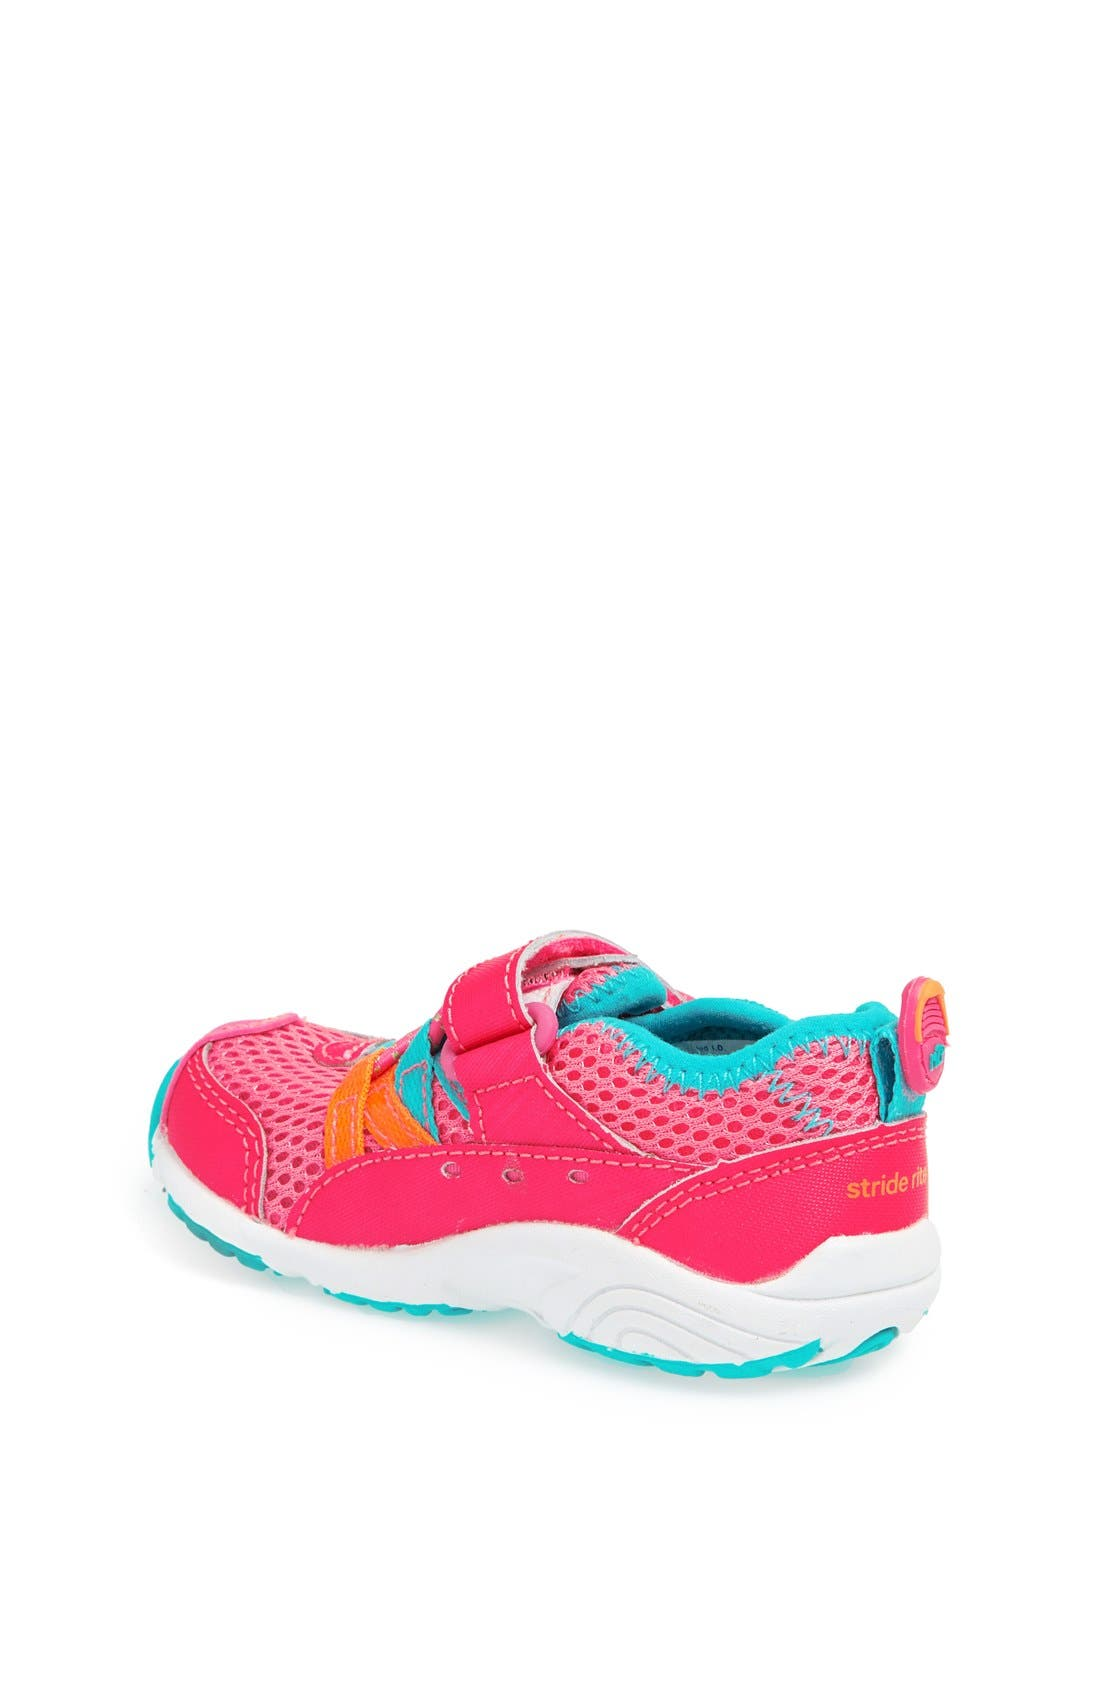 Alternate Image 2  - Stride Rite 'Made 2 Play™ - Aqua' Sneaker (Baby, Walker & Toddler)